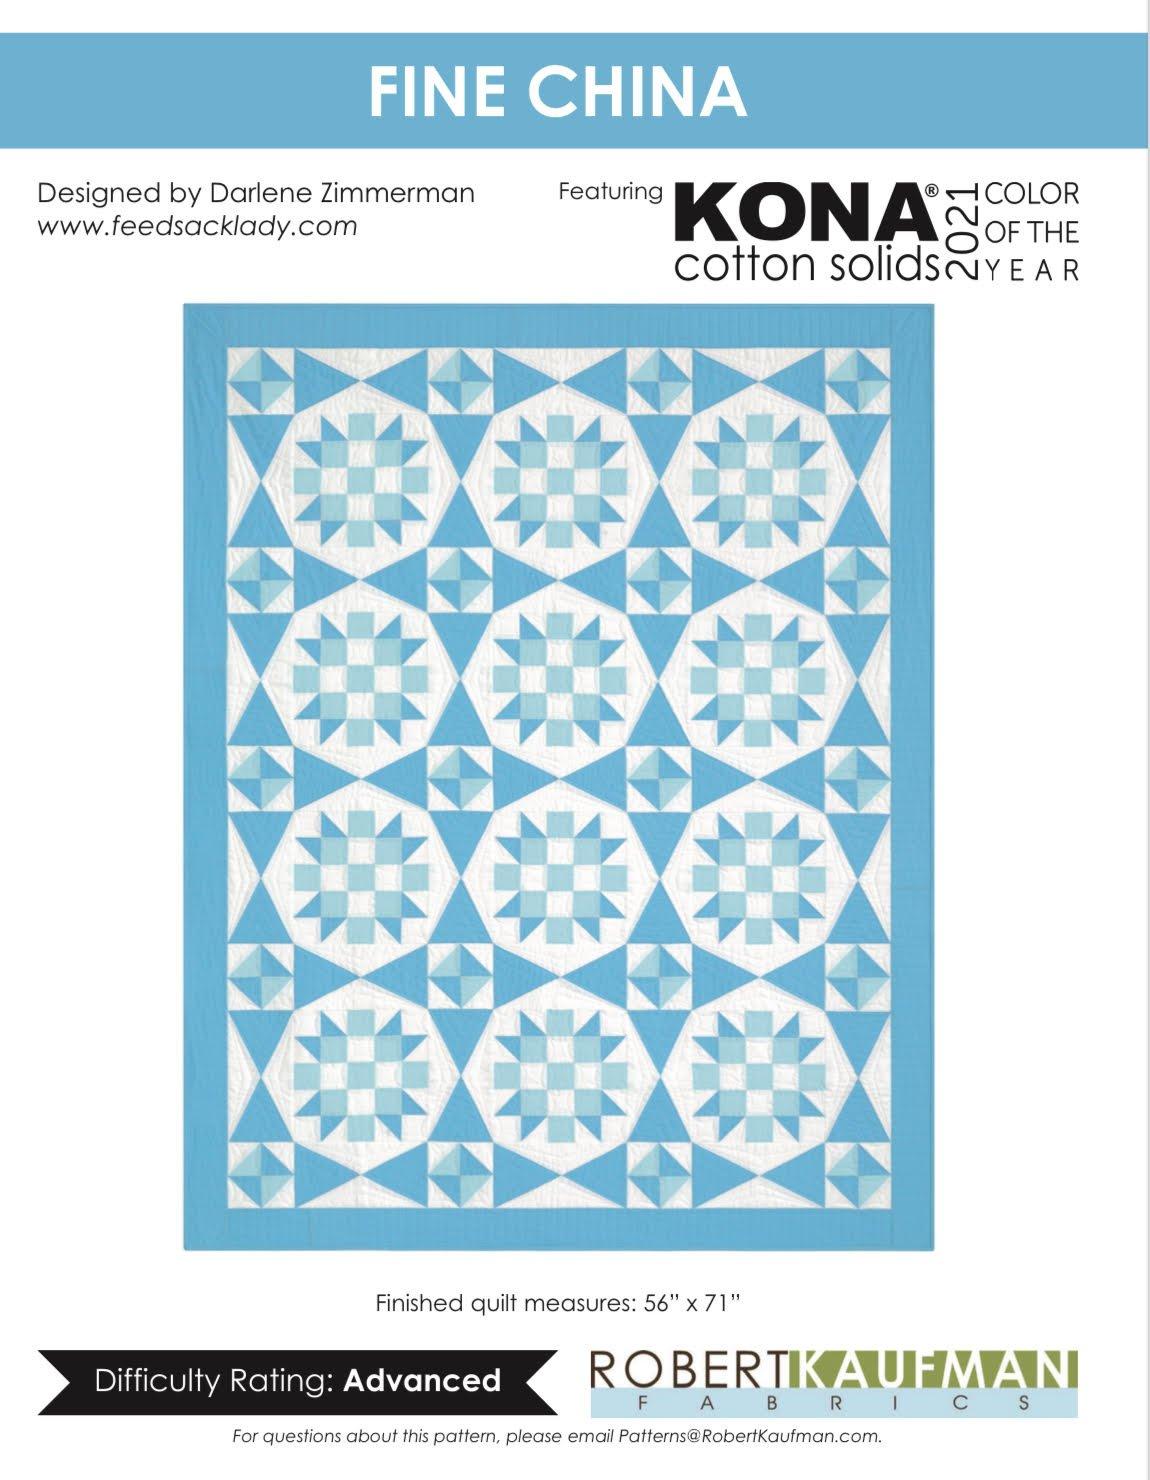 Kona Solid's Fine China Quilt Kit